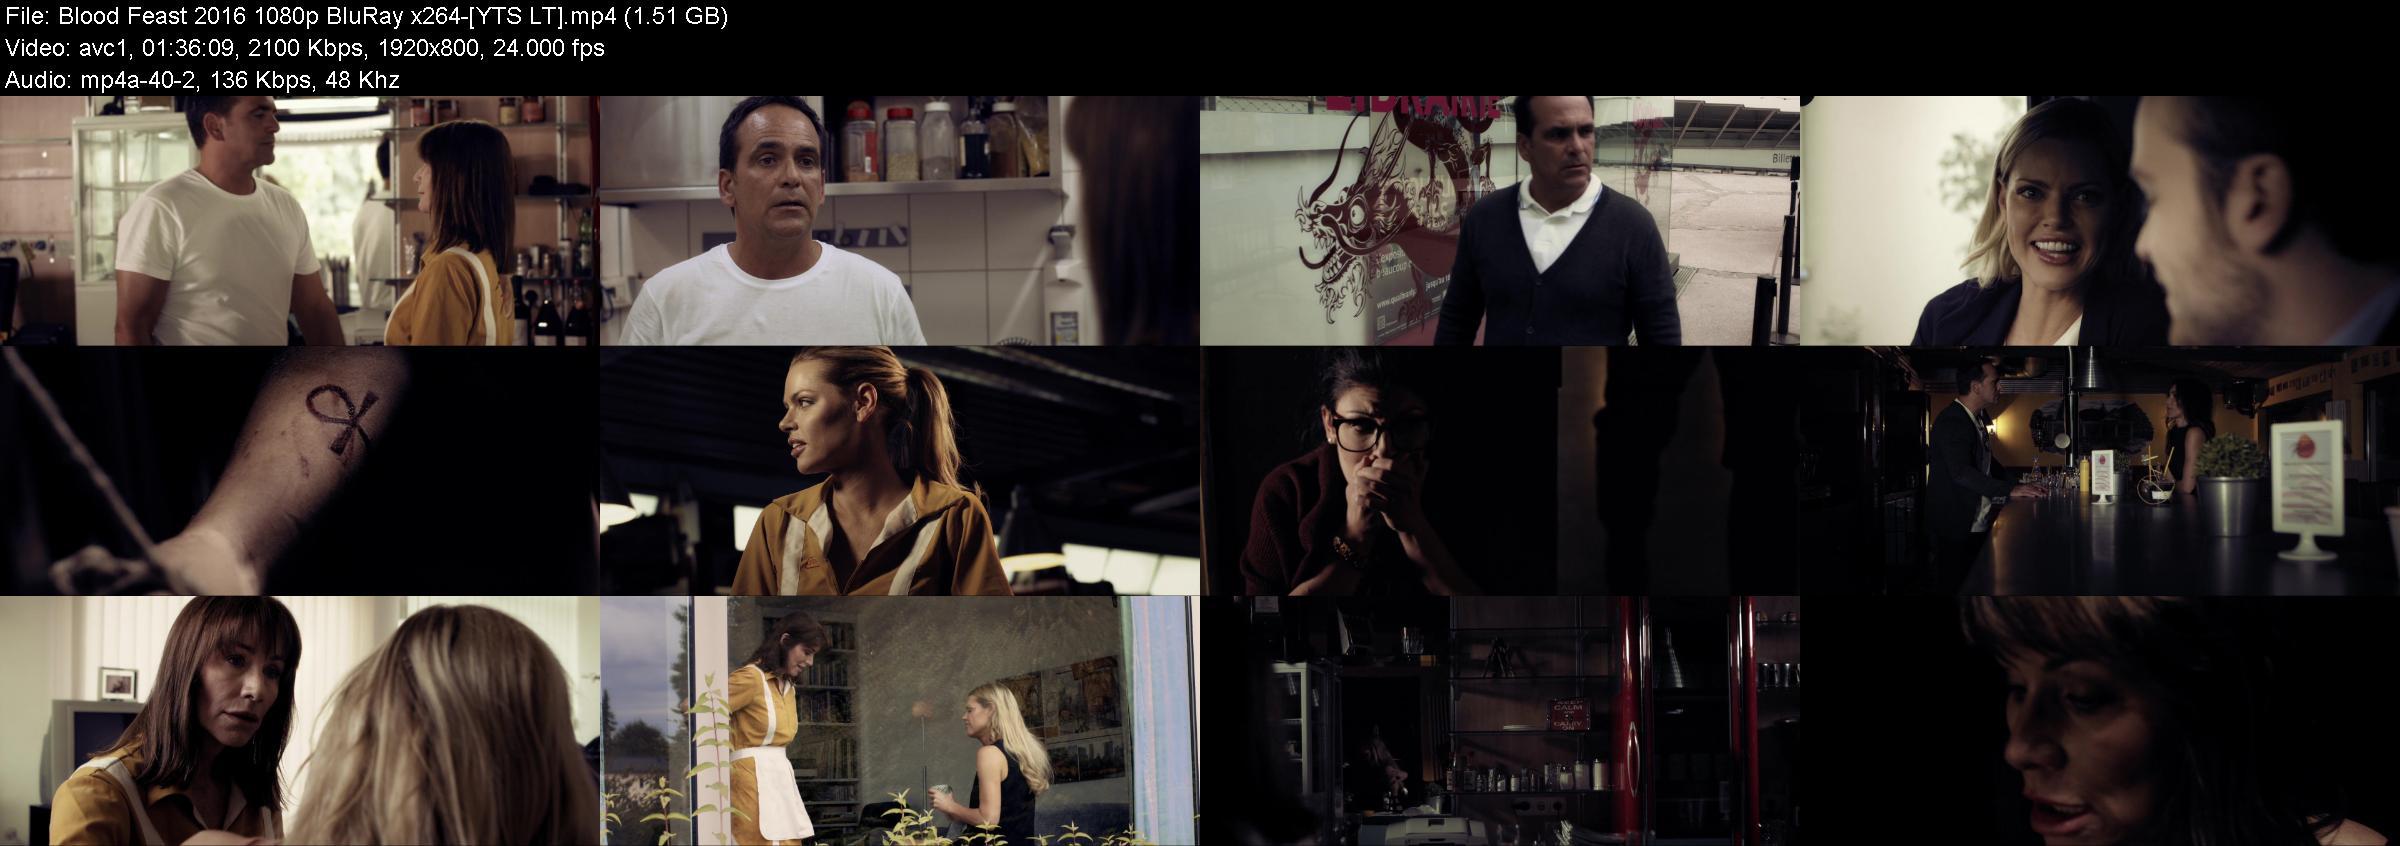 Blood Feast (2016) BluRay 1080p YIFY